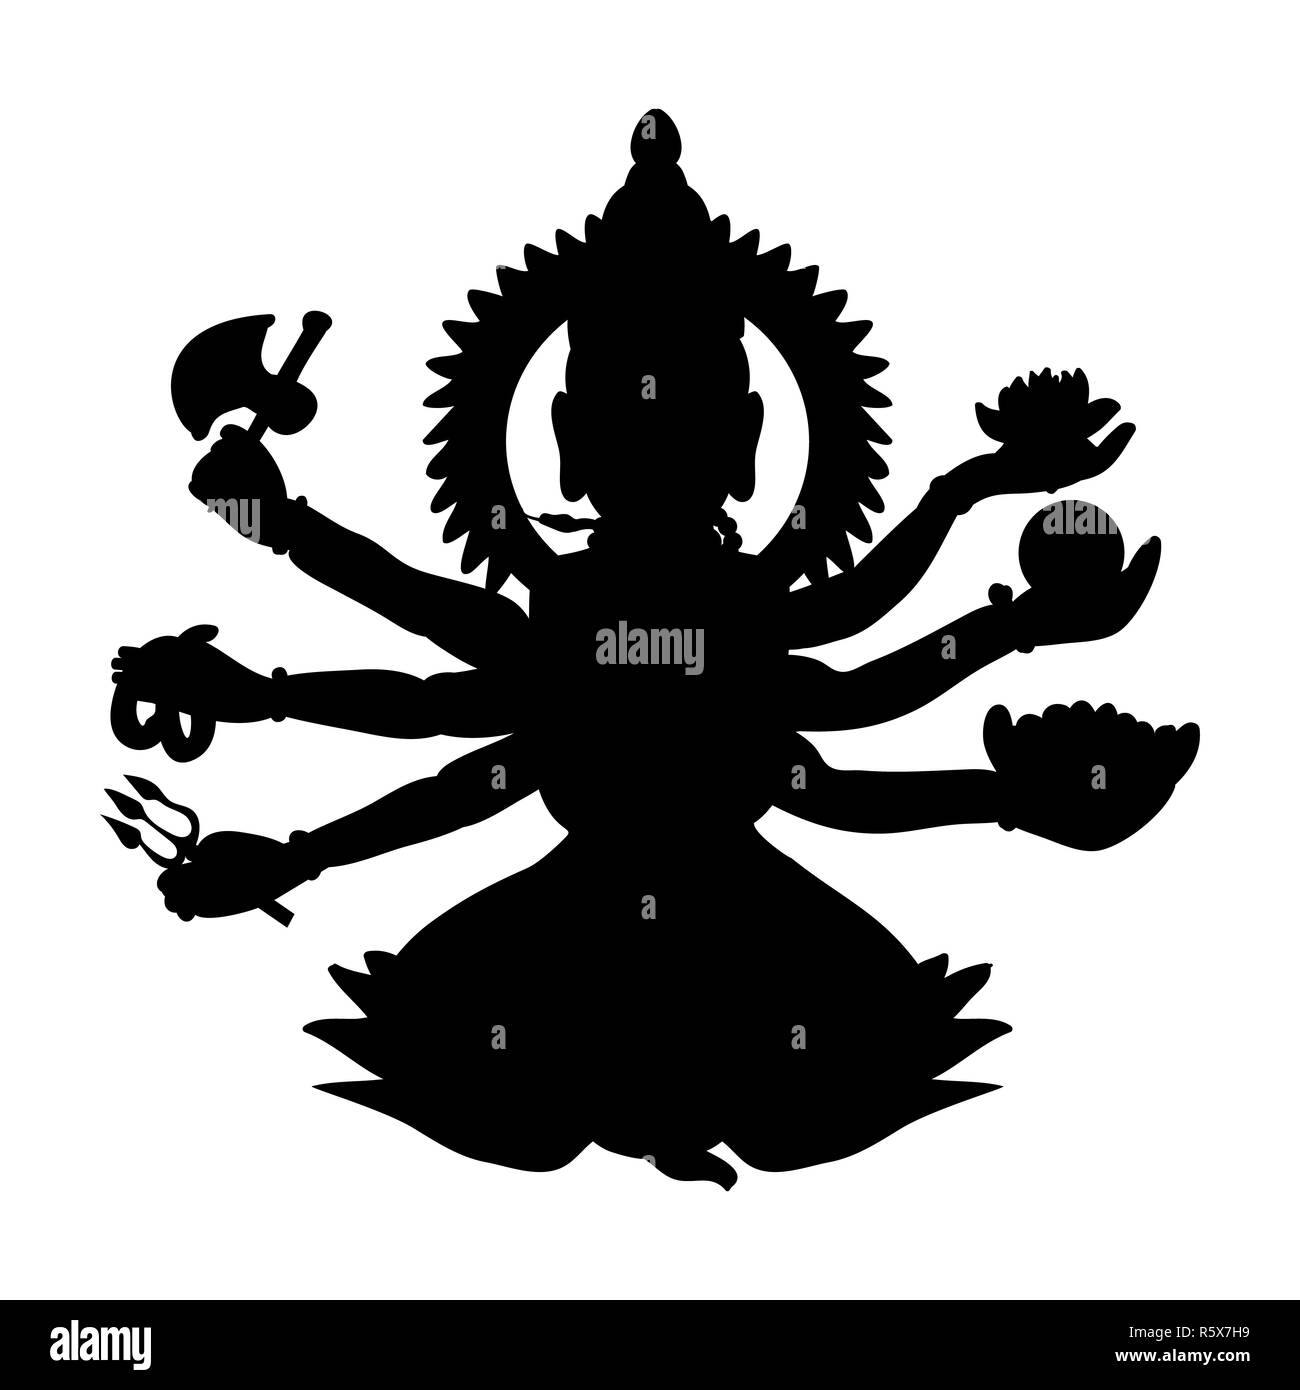 Shiva silhouette traditional religion spirituality - Stock Image